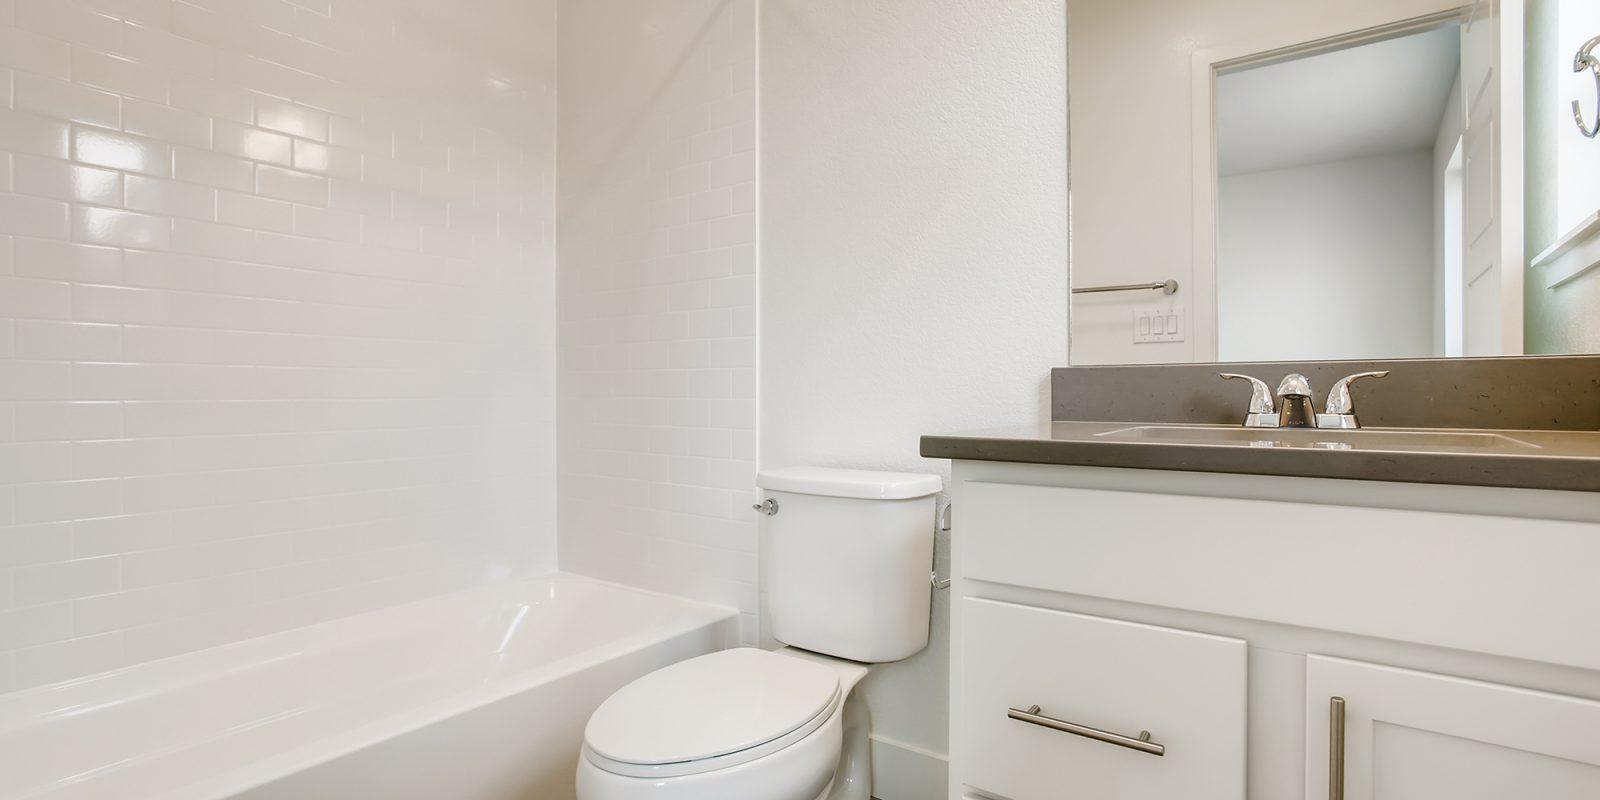 WestRidge: Garland - Secondary Bathroom